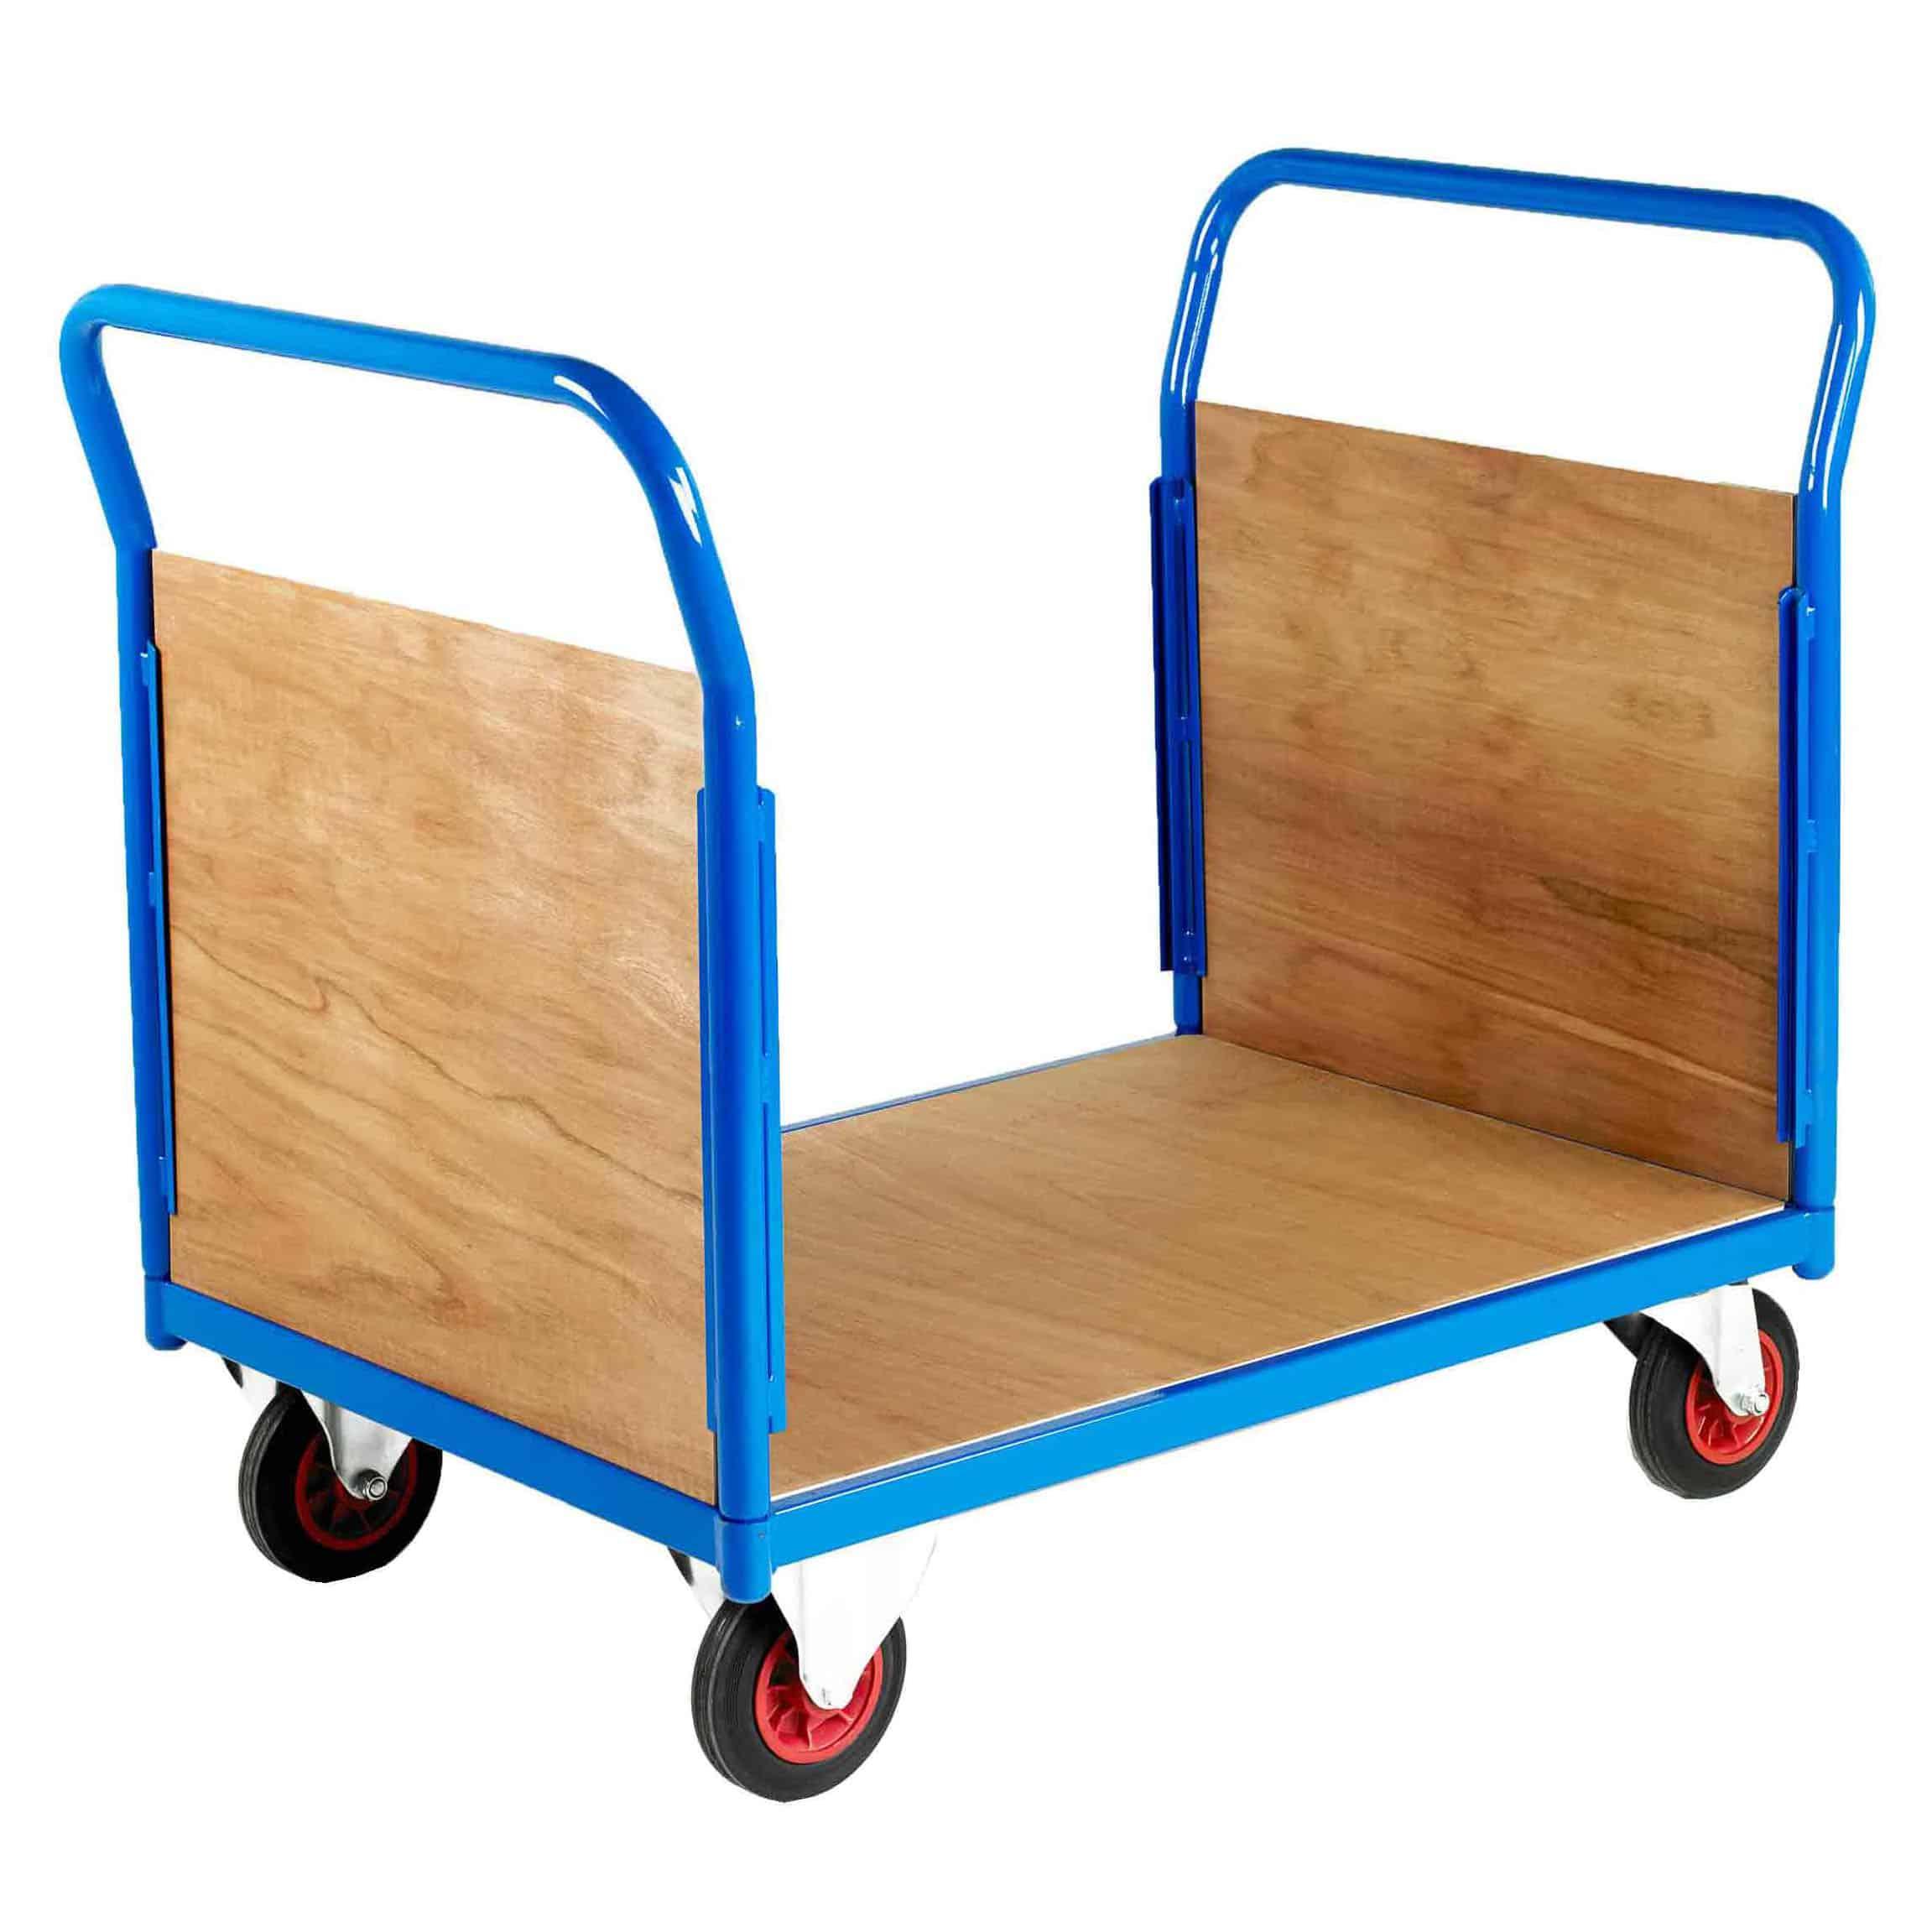 500 Double End Timber Platform Trolleys